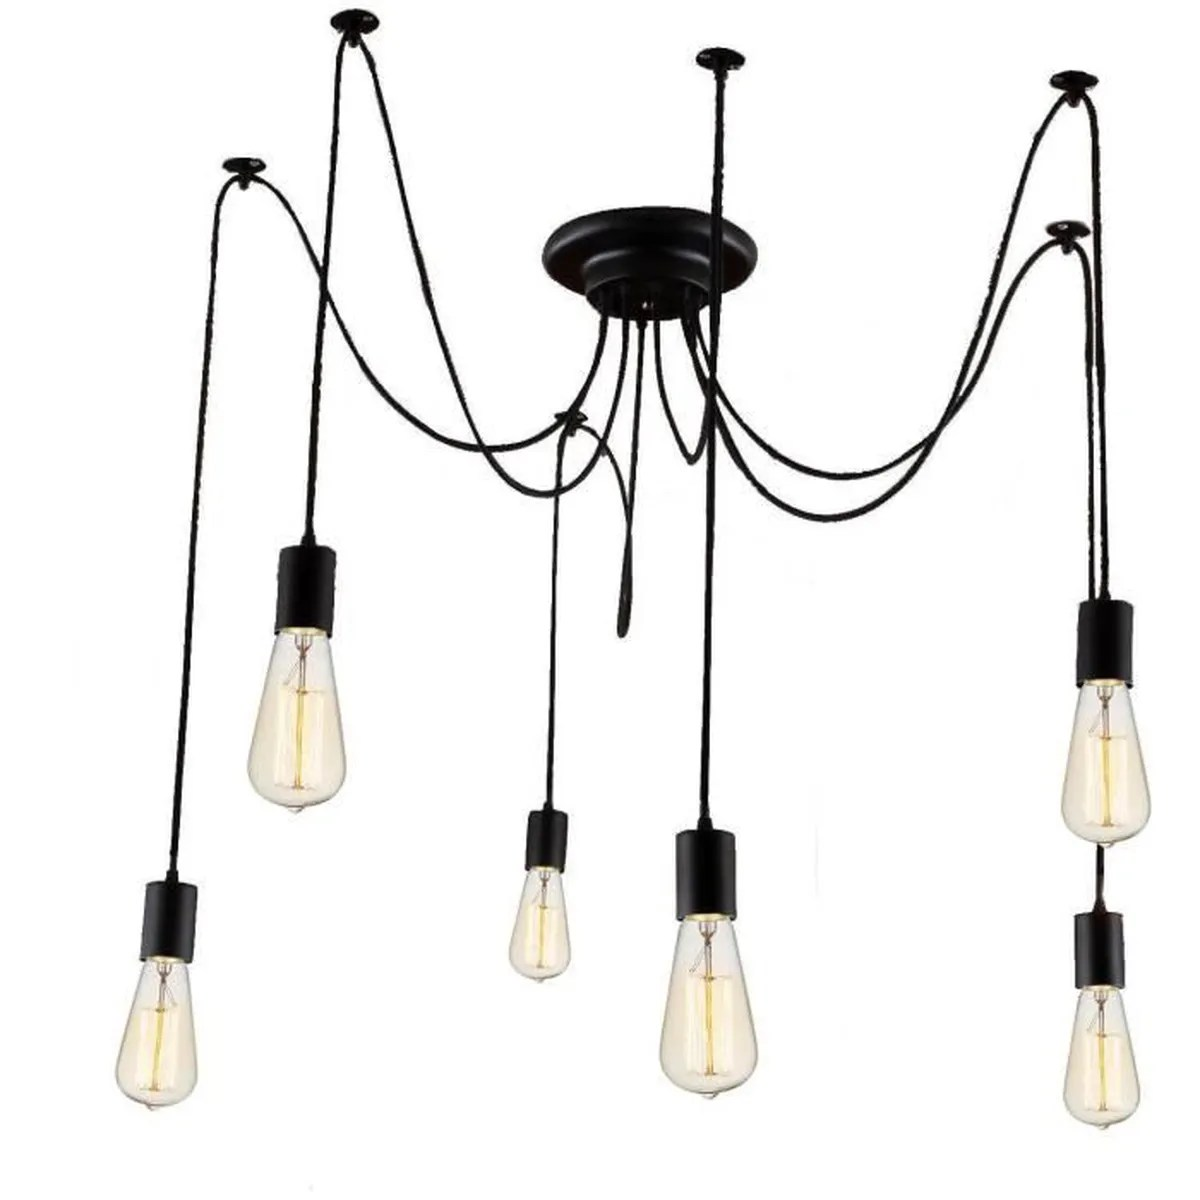 6 E27 Retro Lampe Suspension Diy Lustre Industriel Grenier